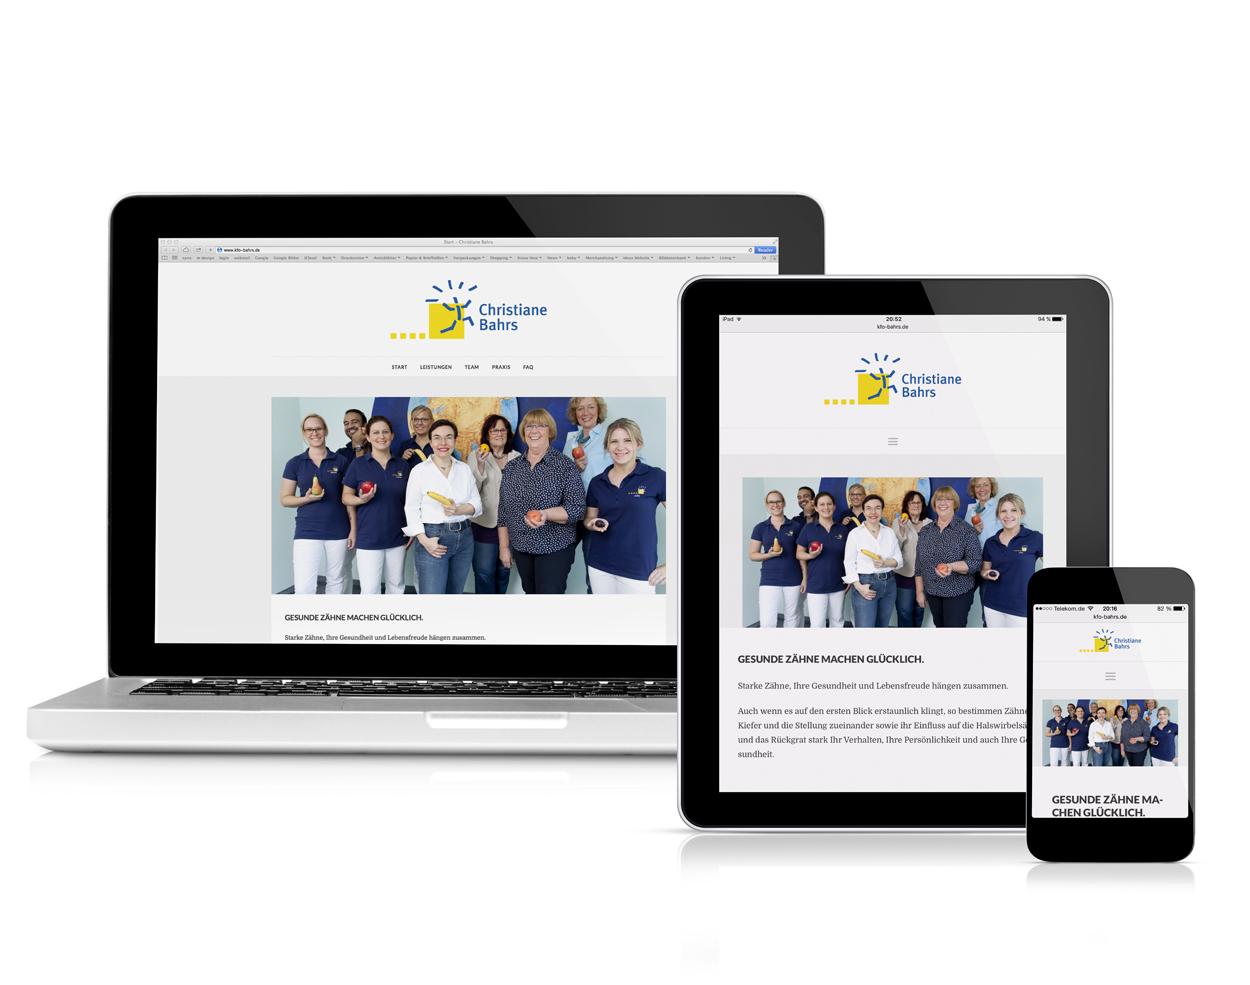 praxismarketing muelheim zahnarzt BCvision marketing & communication